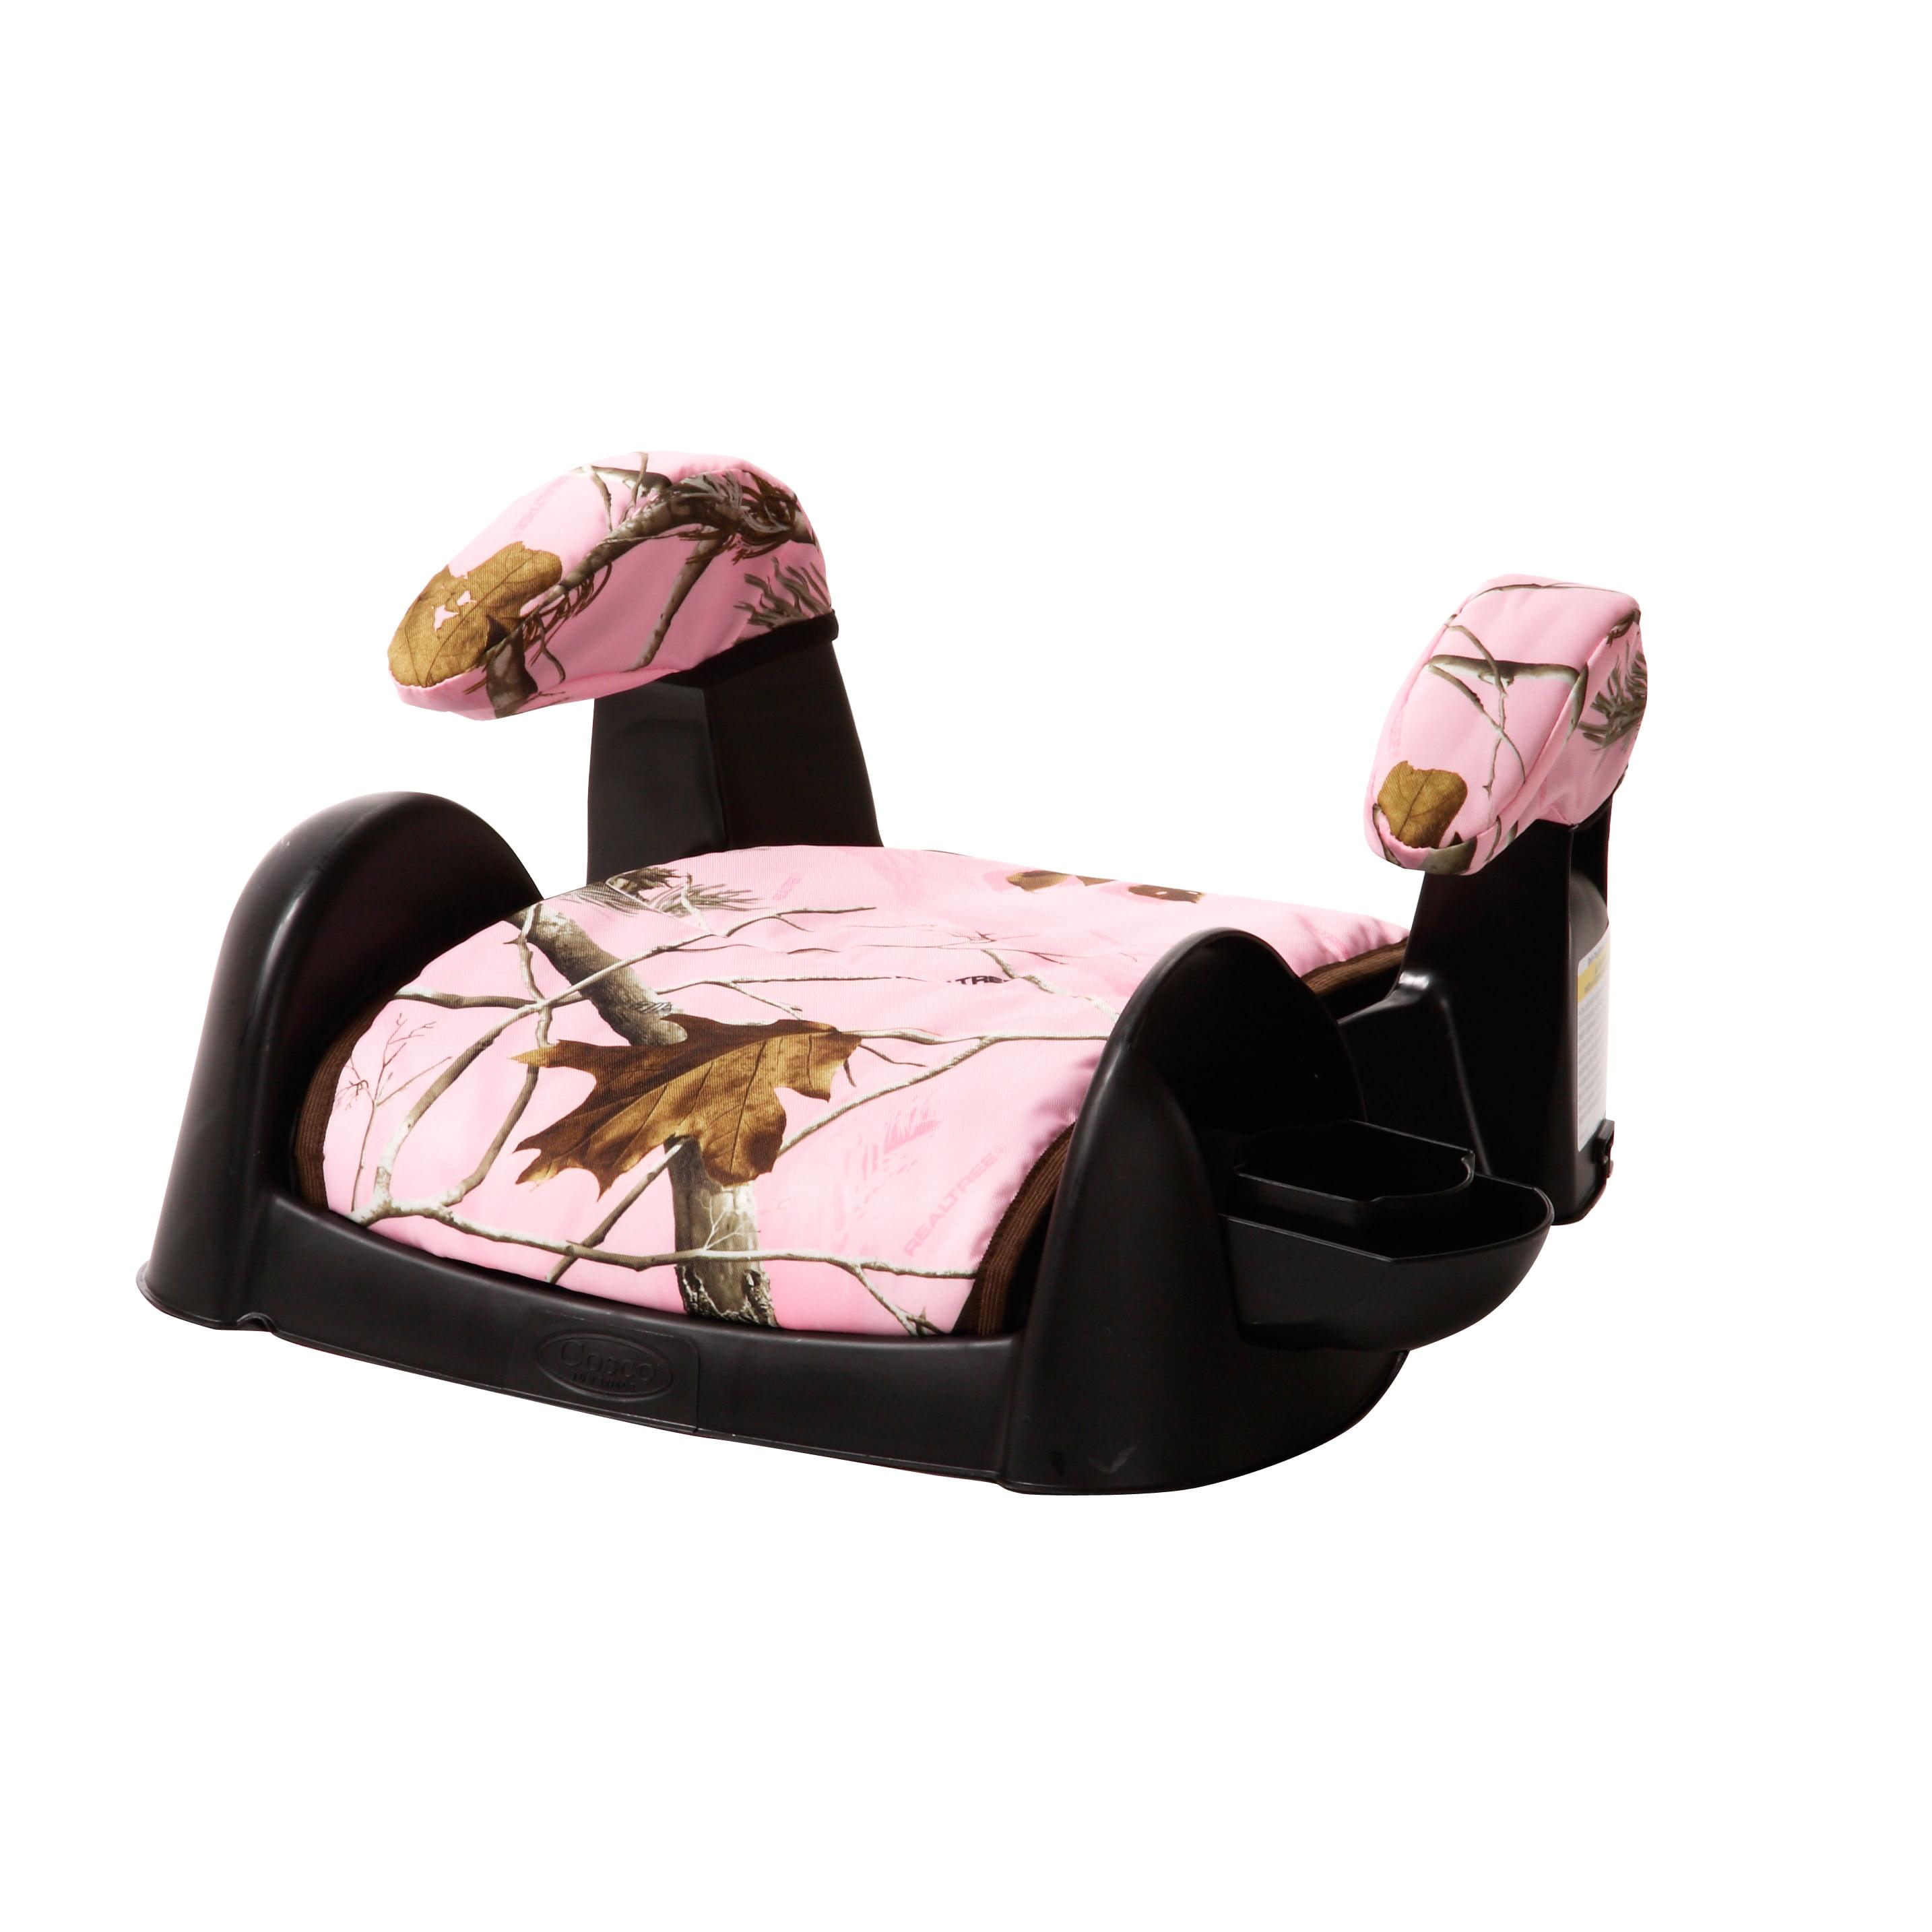 Dorel Juvenile Cosco® Ambassador Booster Car Seat, Choose...